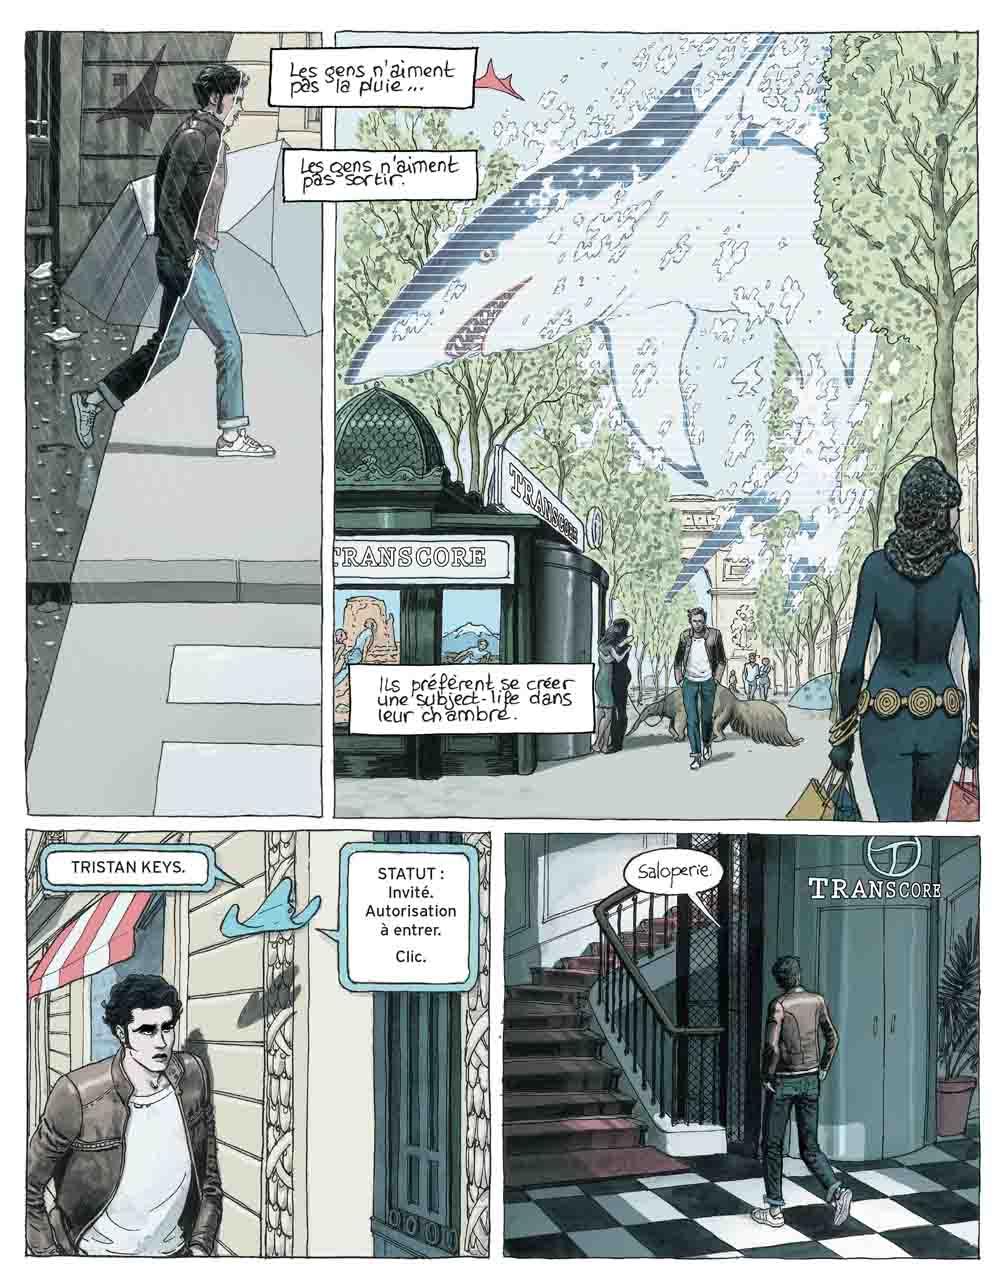 Paris 2119 – Zep & Bertail